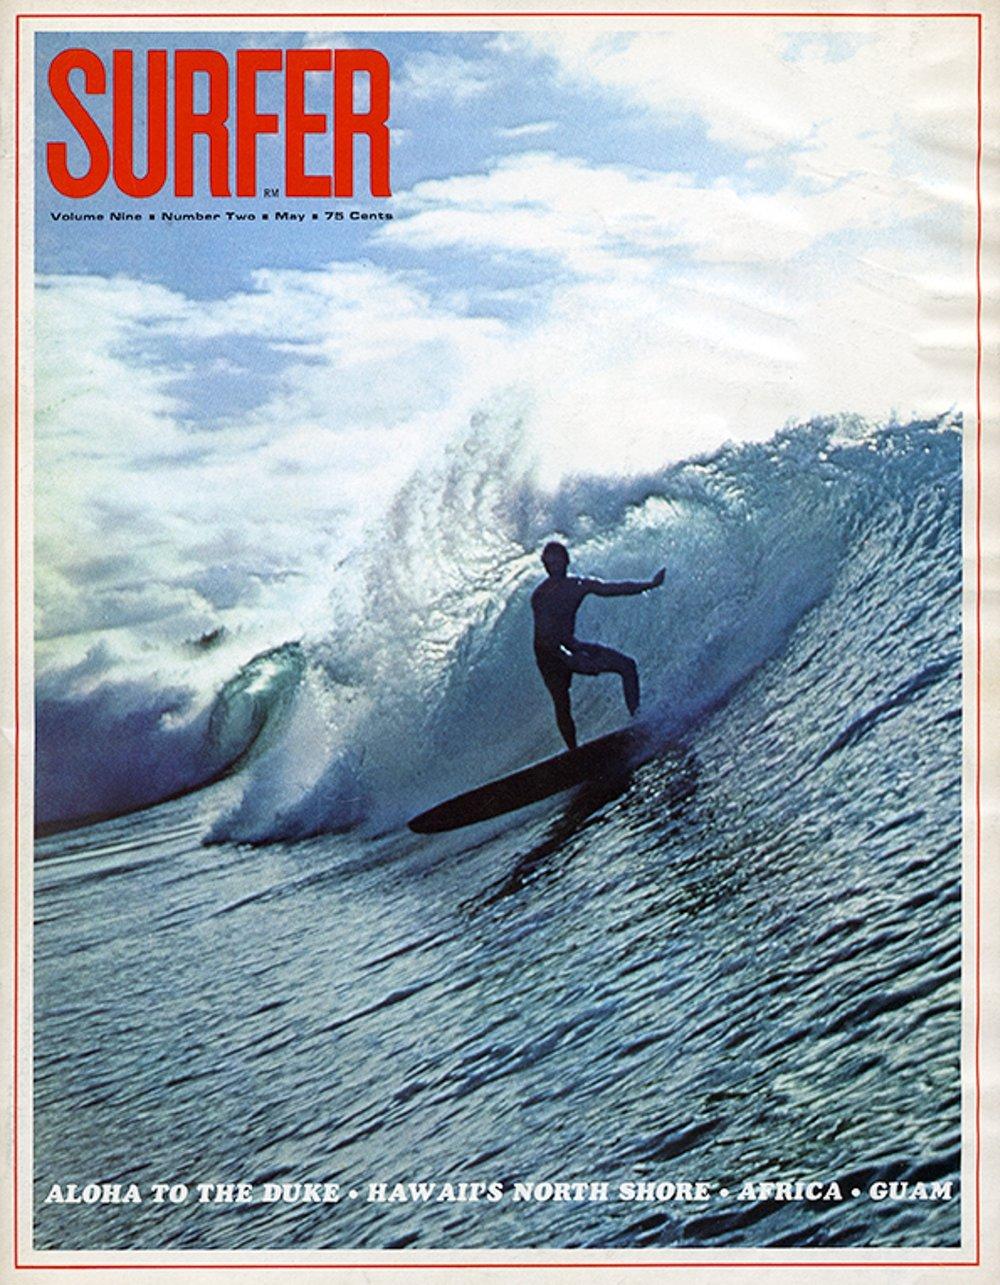 SURFER MAG 1968 - YURI FARRANT